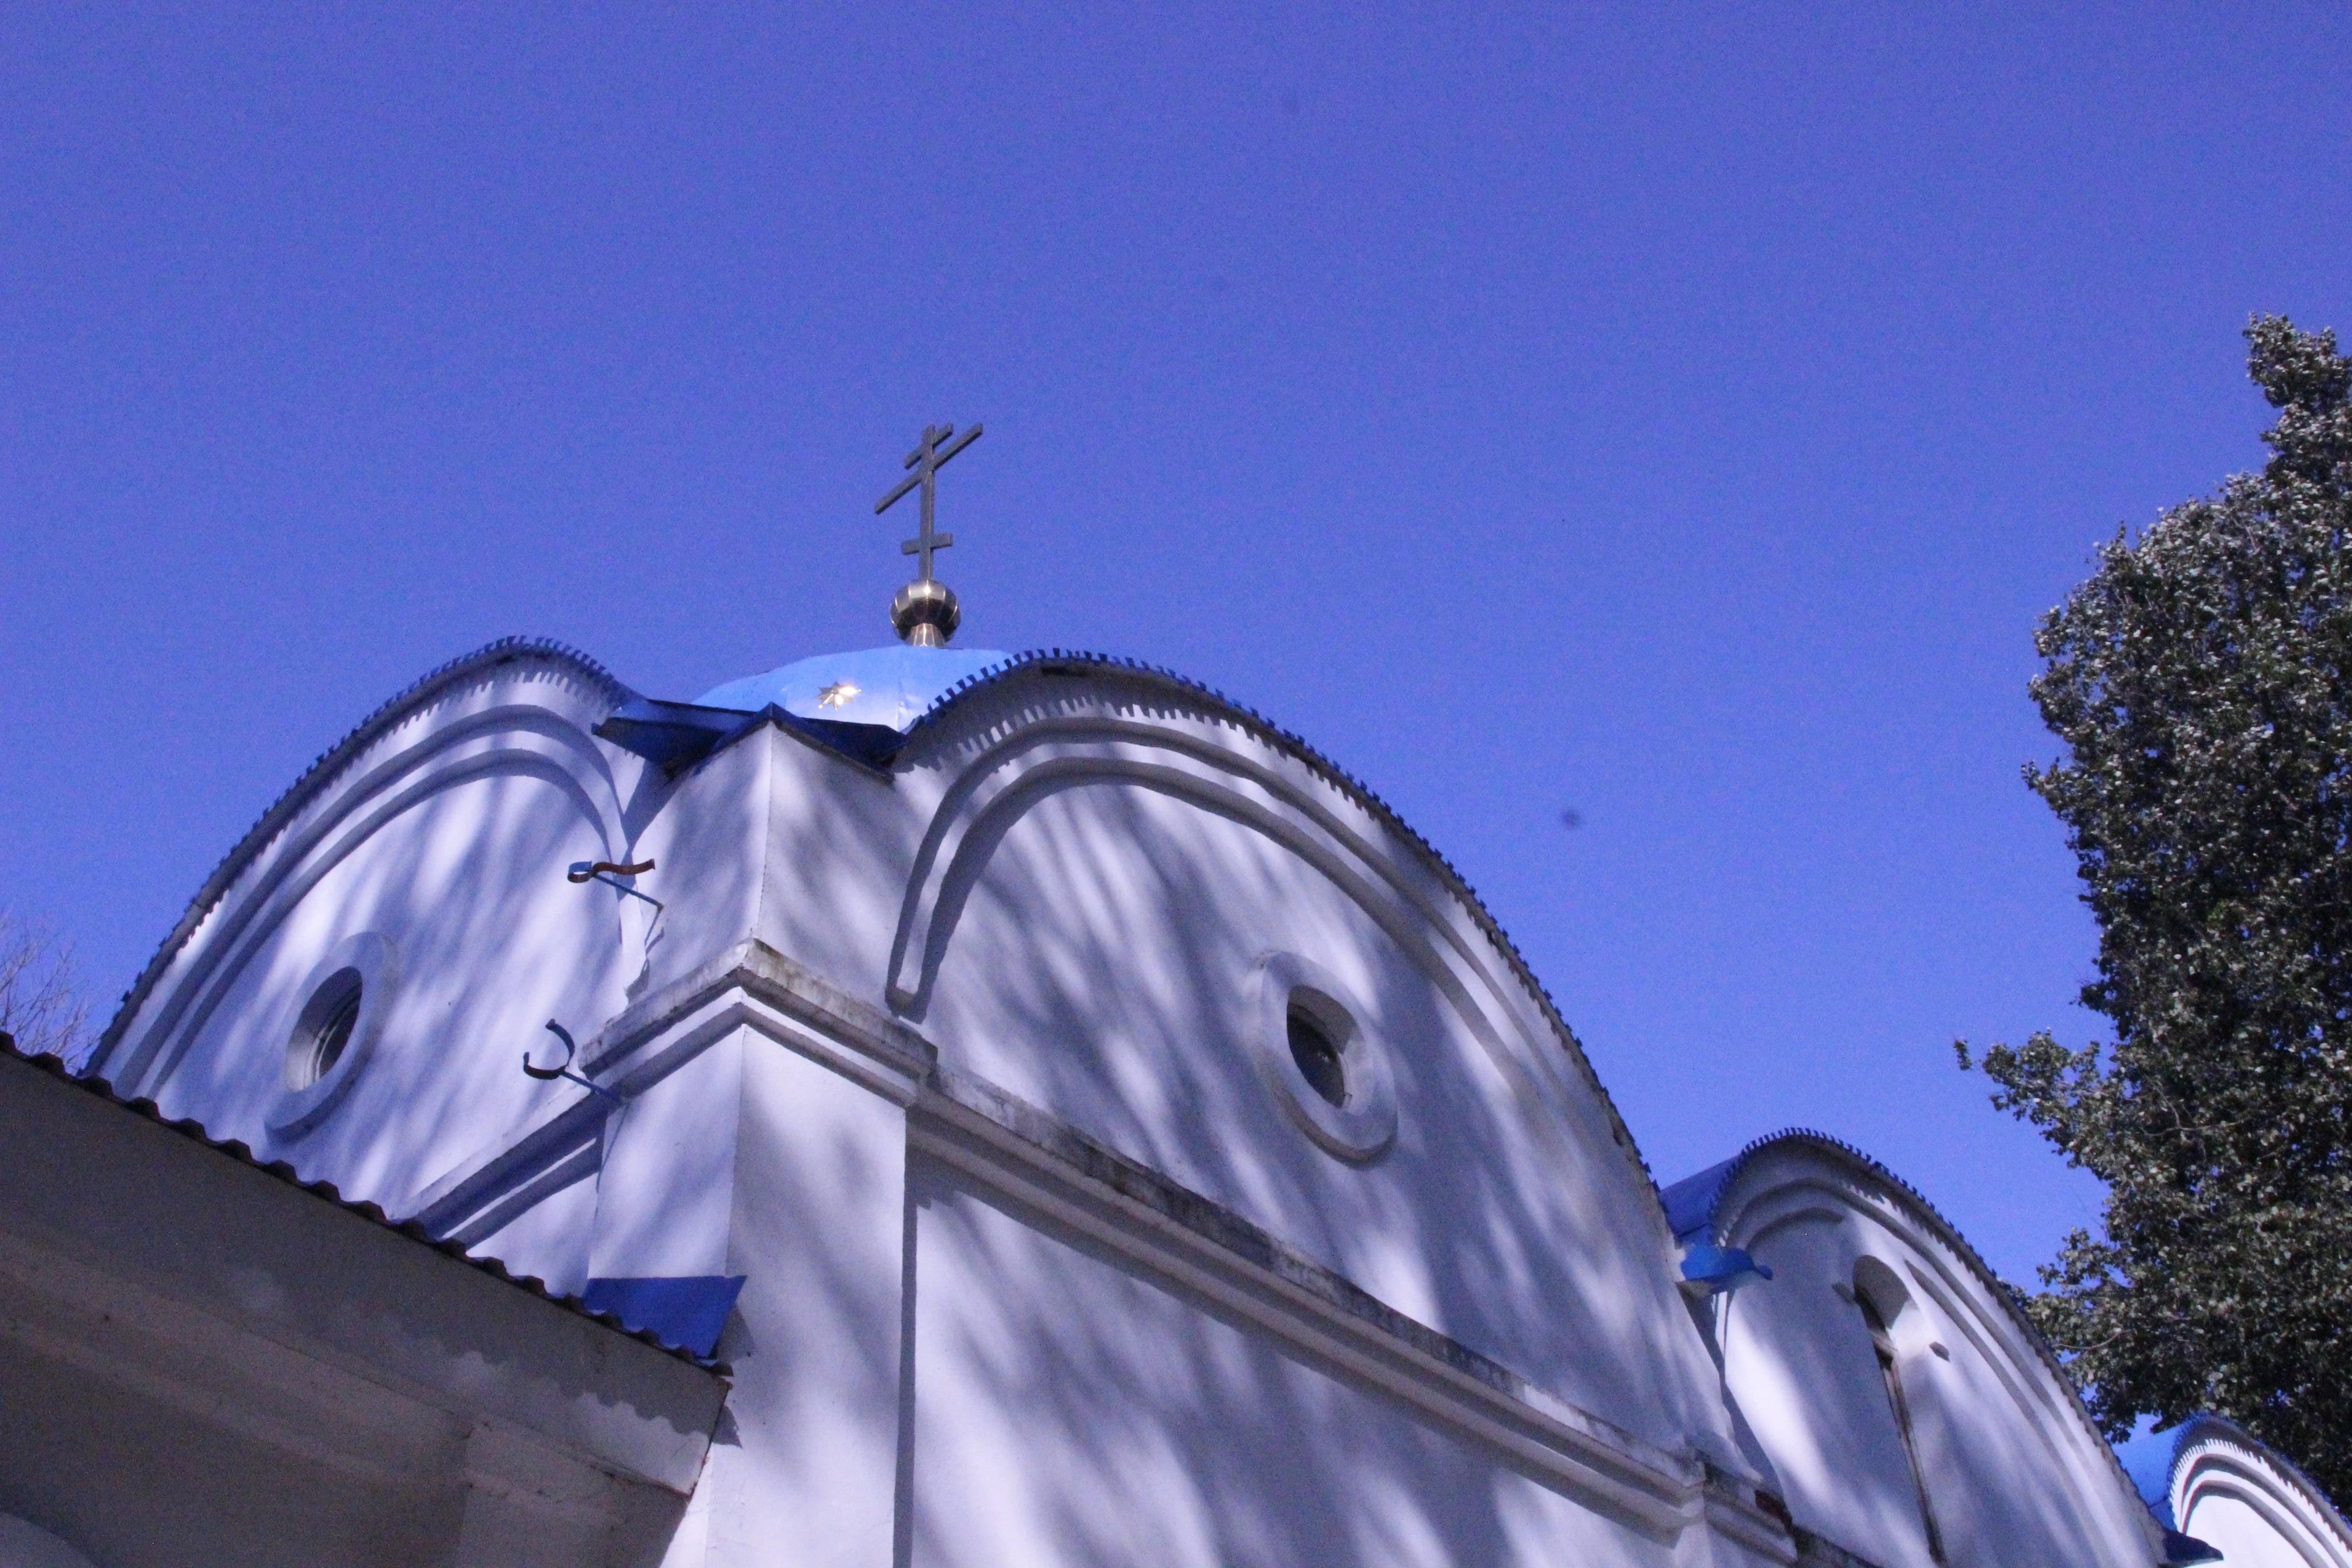 http://monuspen.ru/photoreports/f4fa0e4852806963b5d2157d9dc53b51.JPG